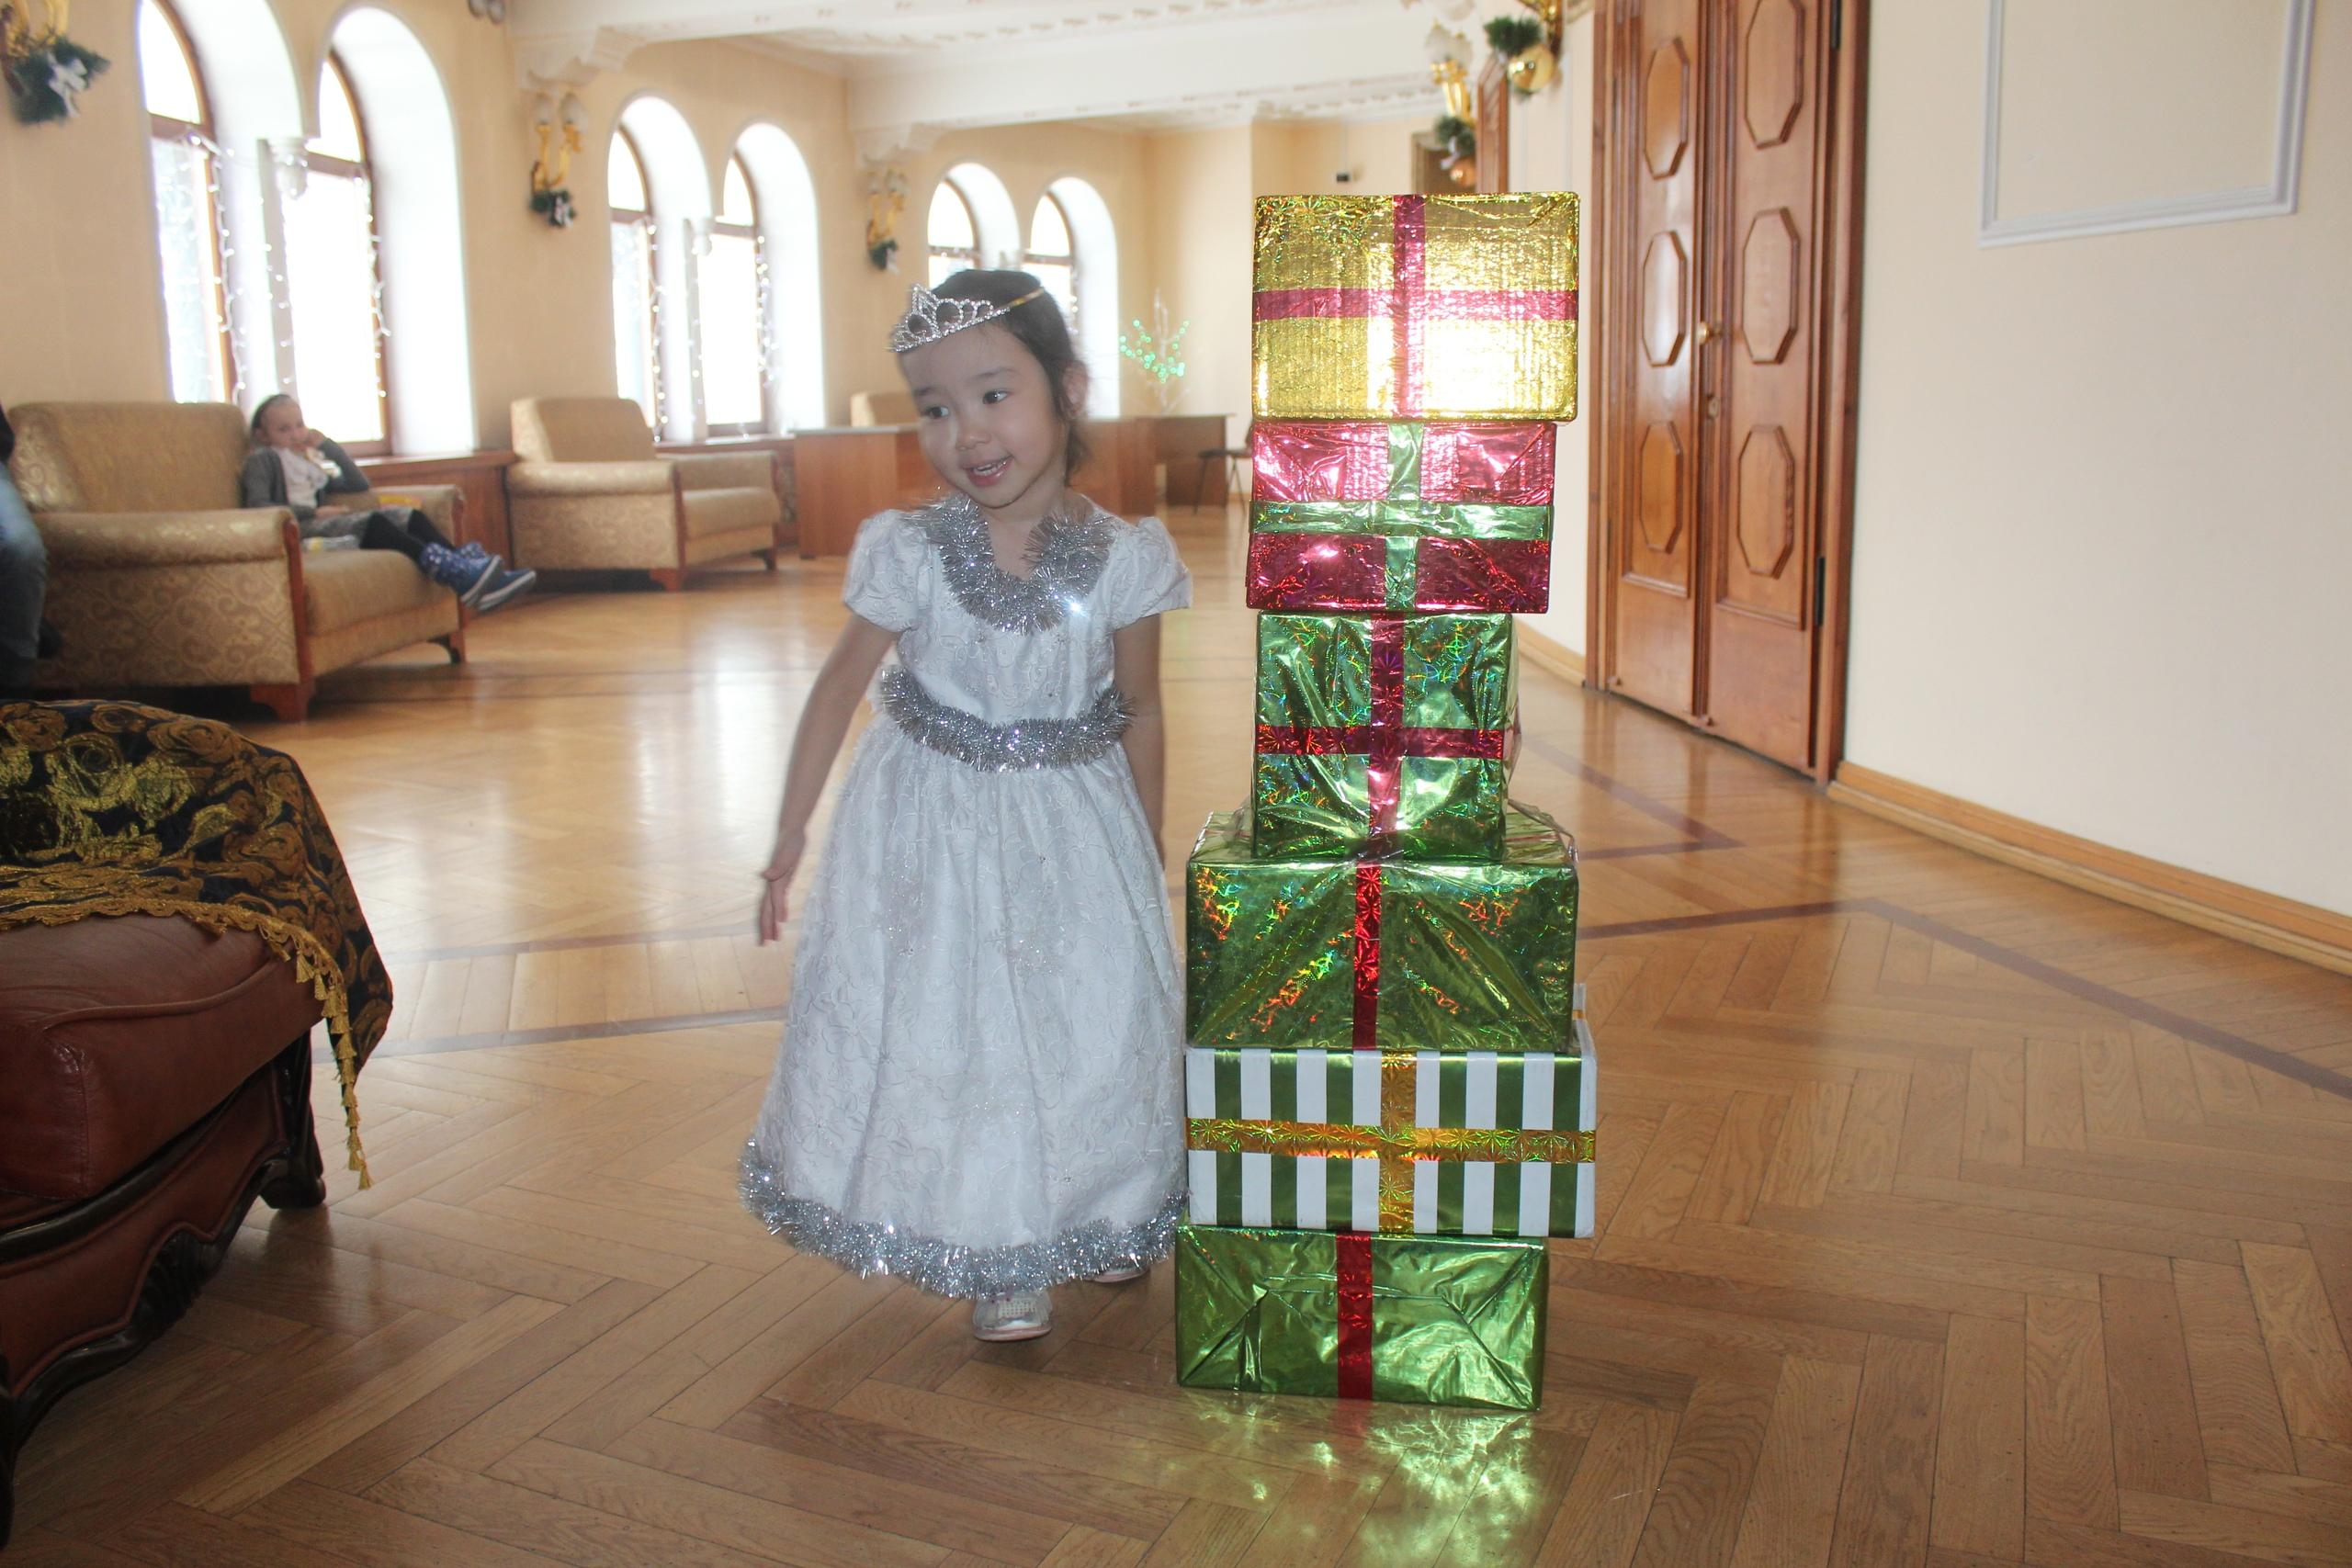 Принцесса лейла. Принцесса собирается на бал